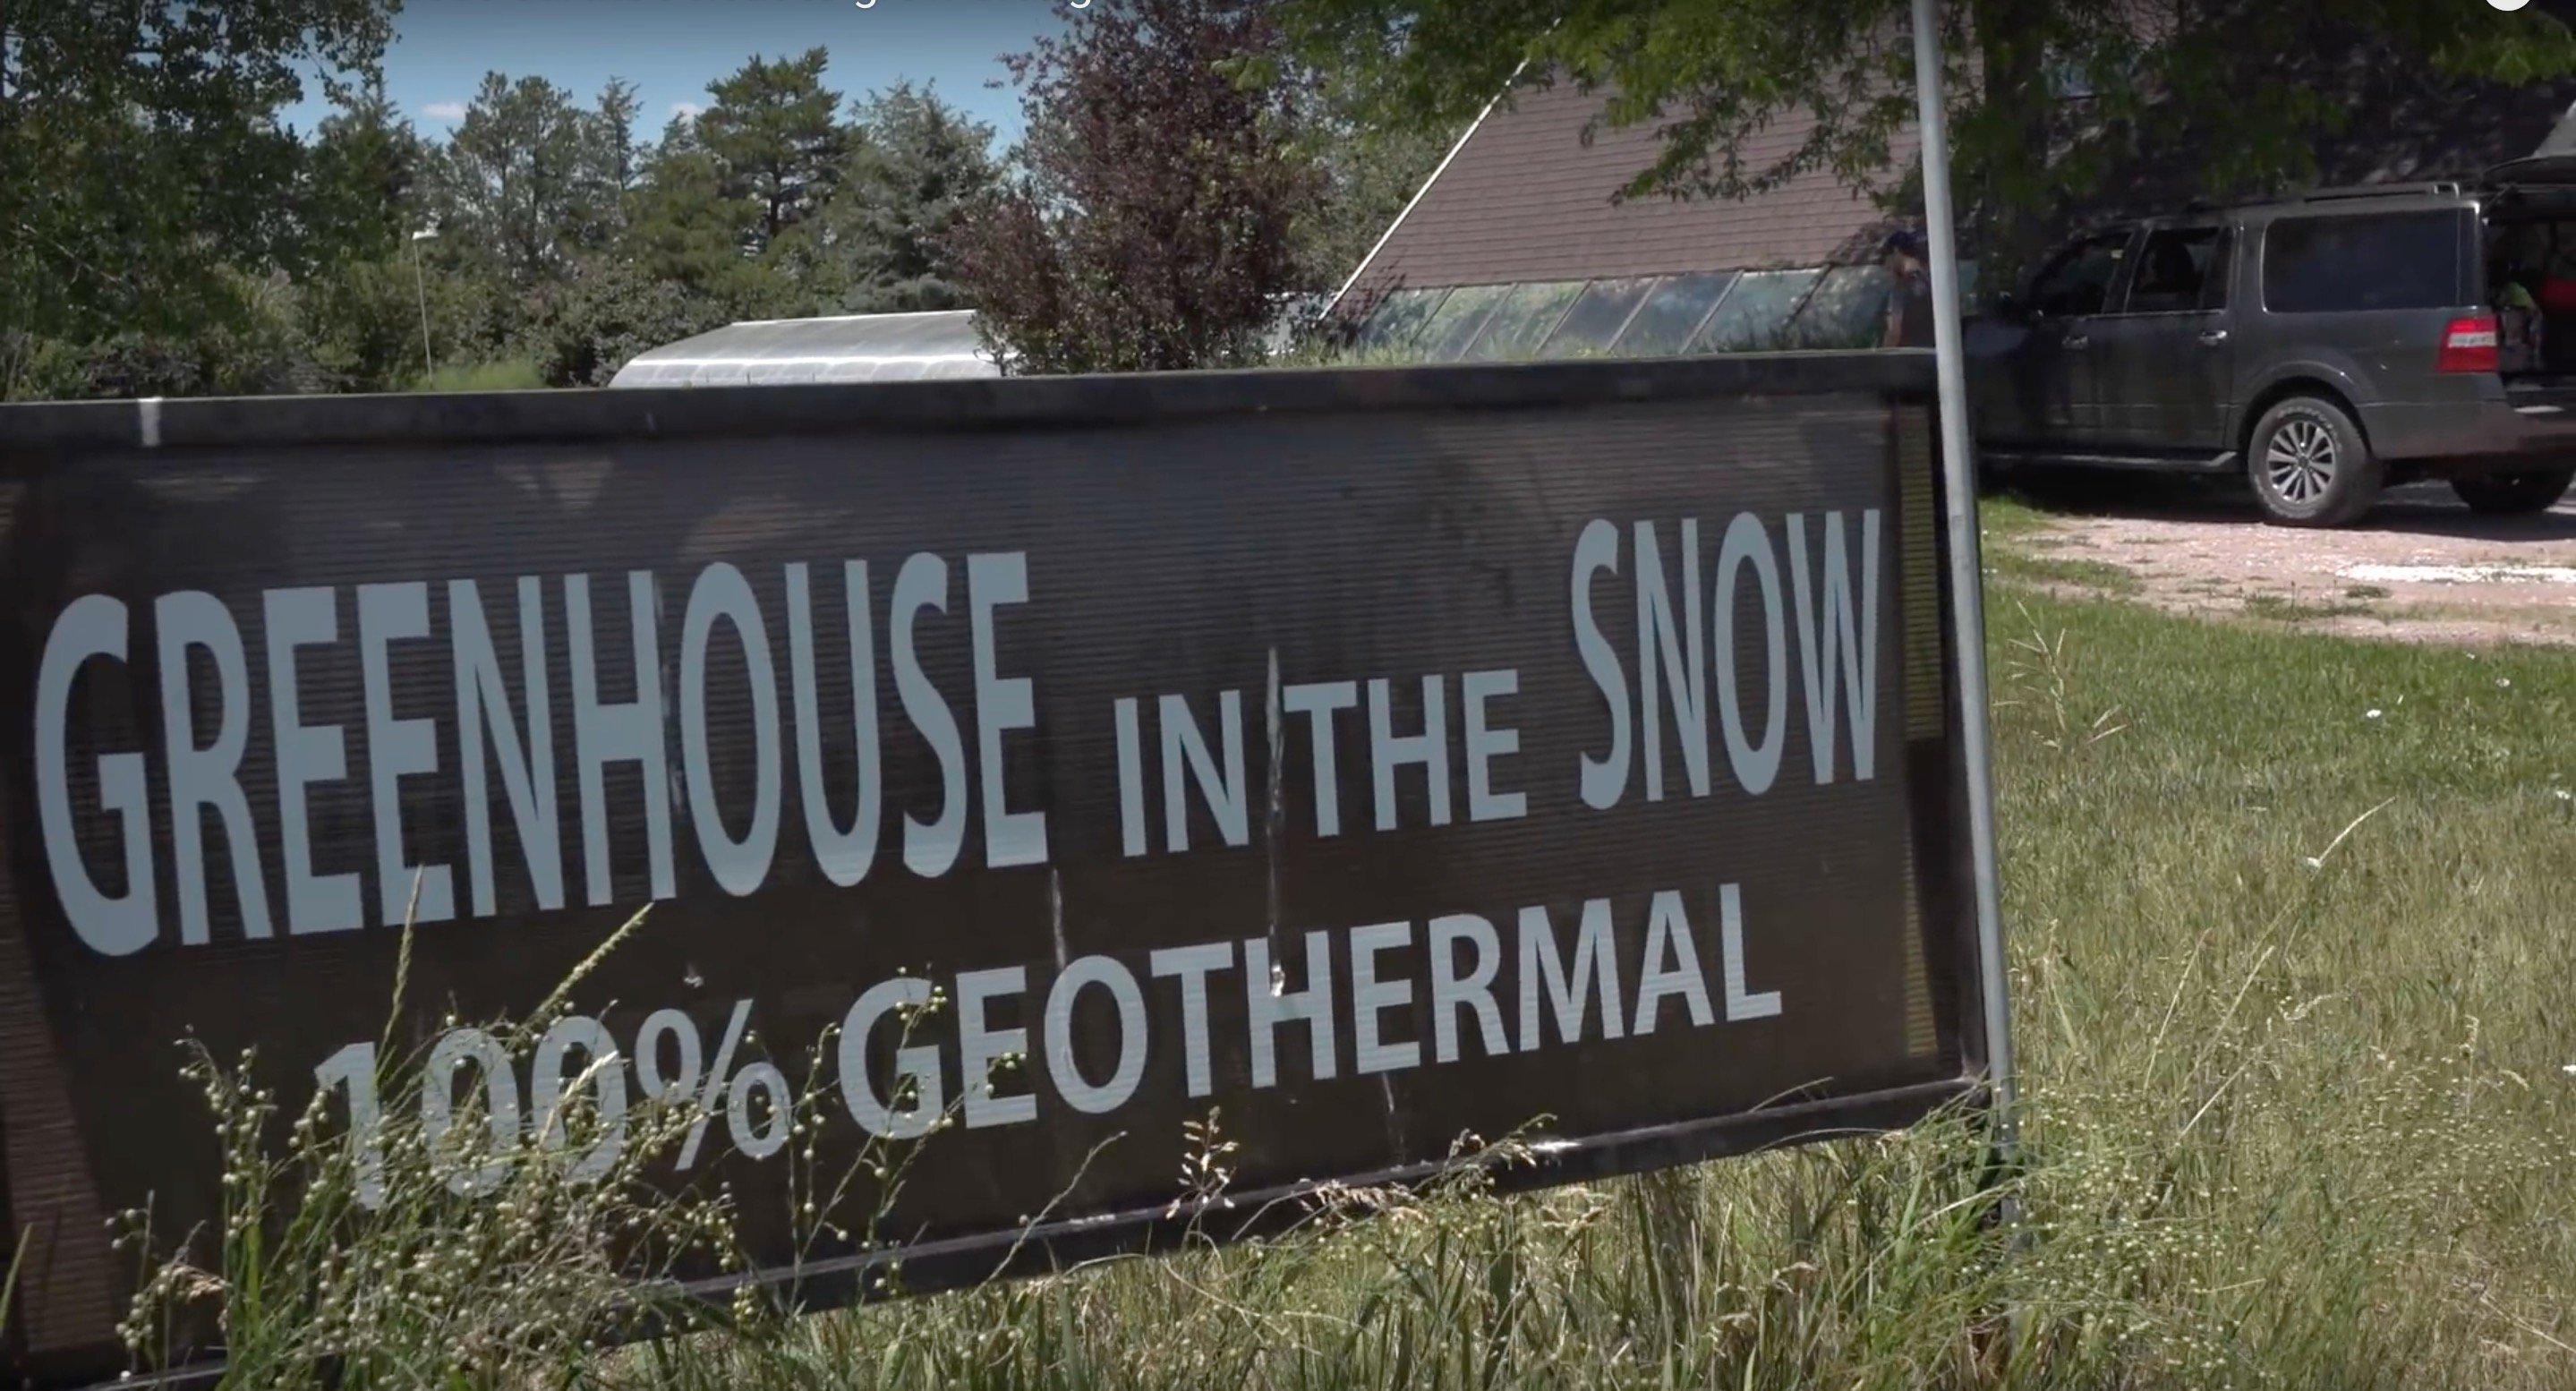 Nebraska Retiree Uses Earth's Heat To Grow Oranges In The Snow...